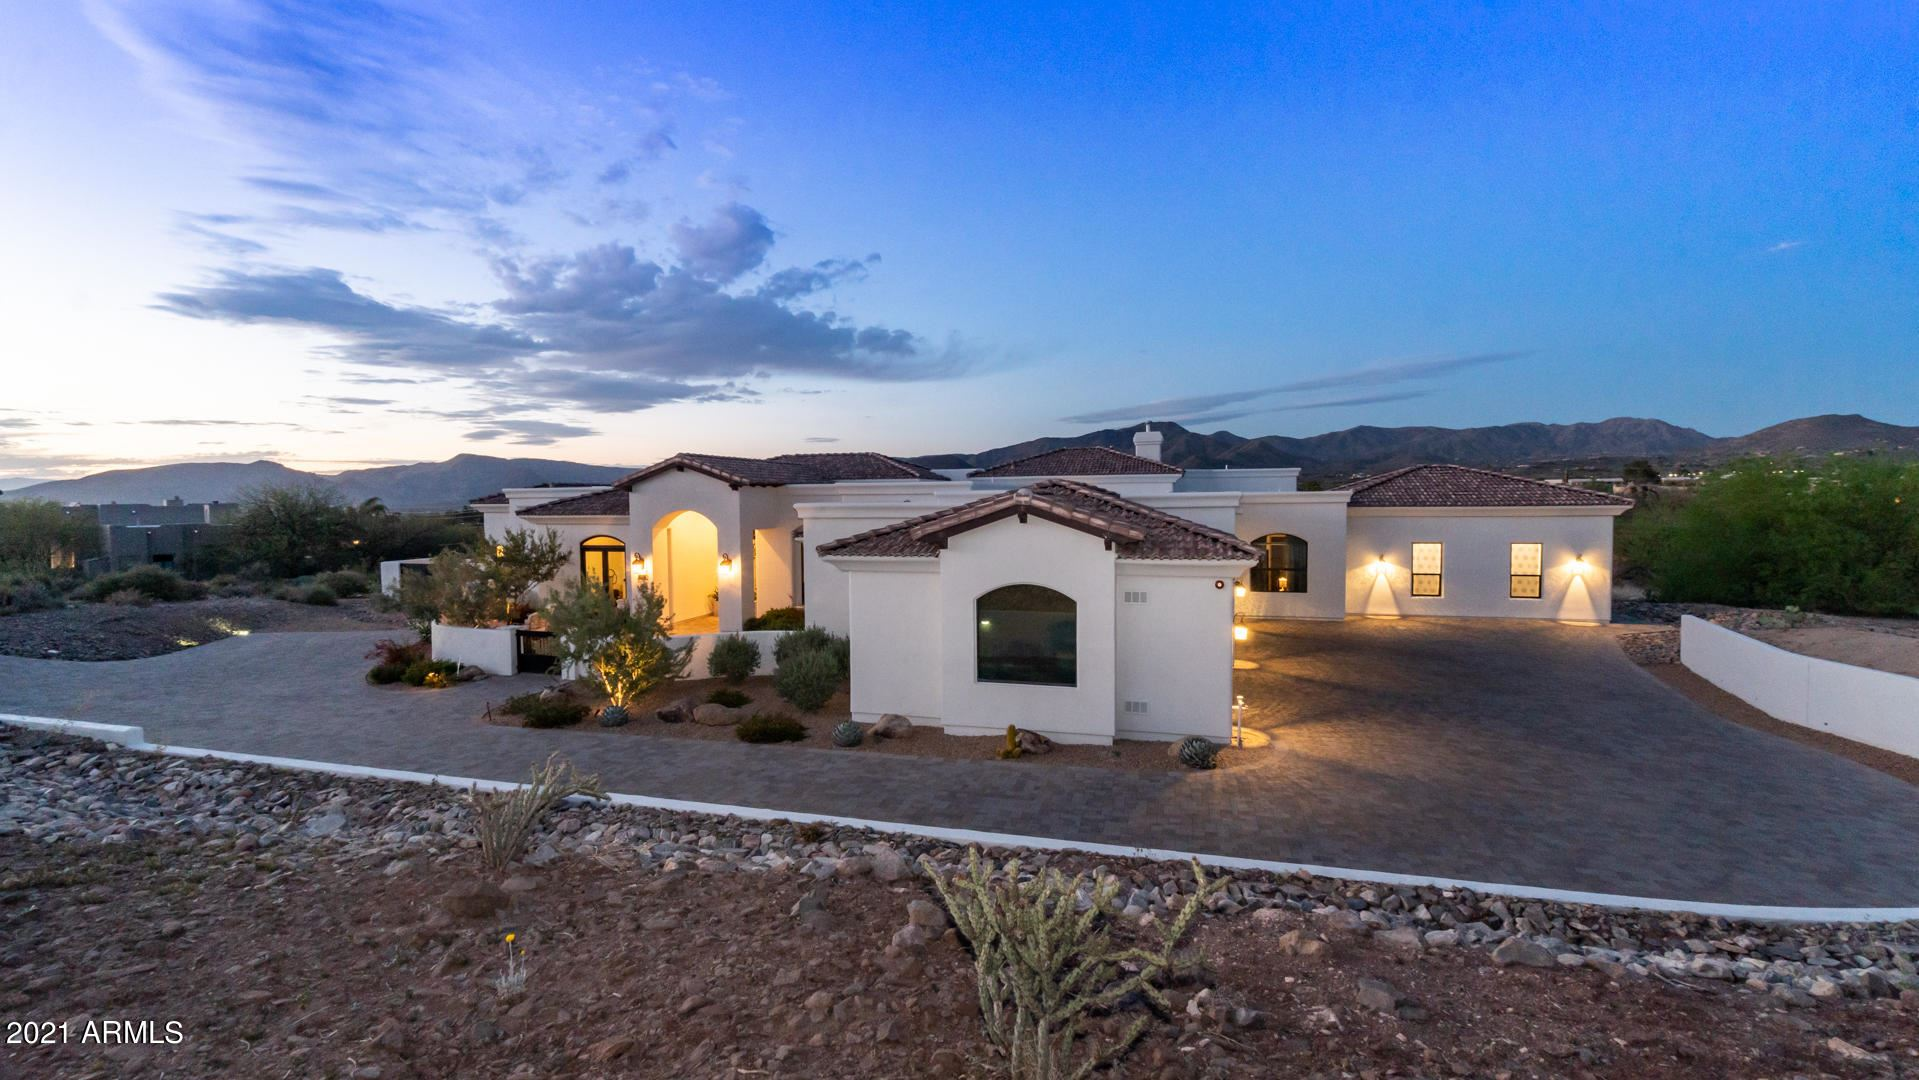 Photo of 7658 E NONCHALANT Avenue, Carefree, AZ 85377 (MLS # 6214459)